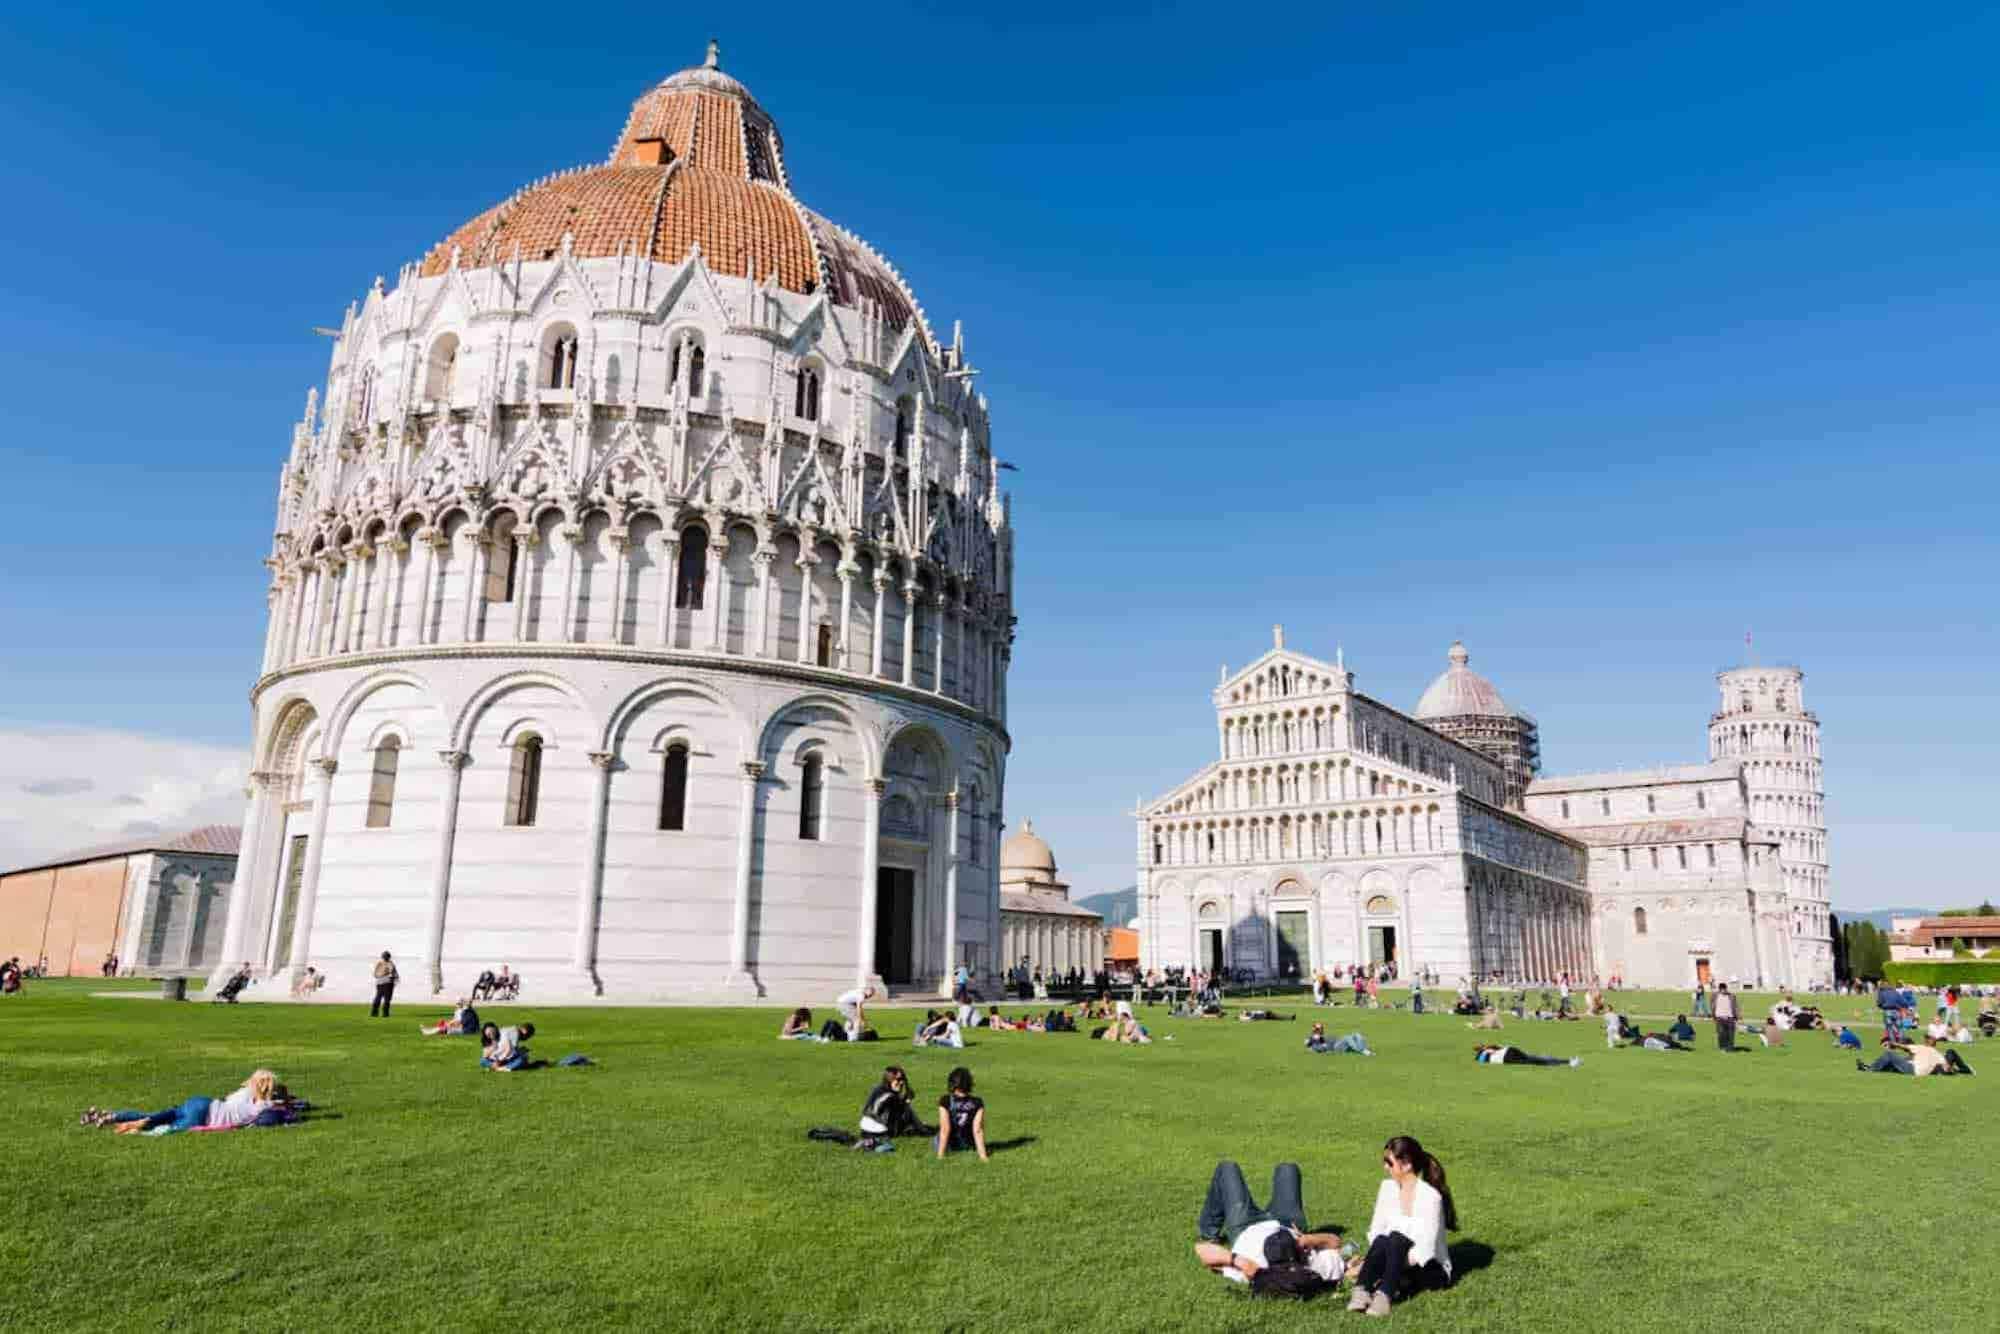 Visit Piazza dei Miracoli on a Pisa road trip